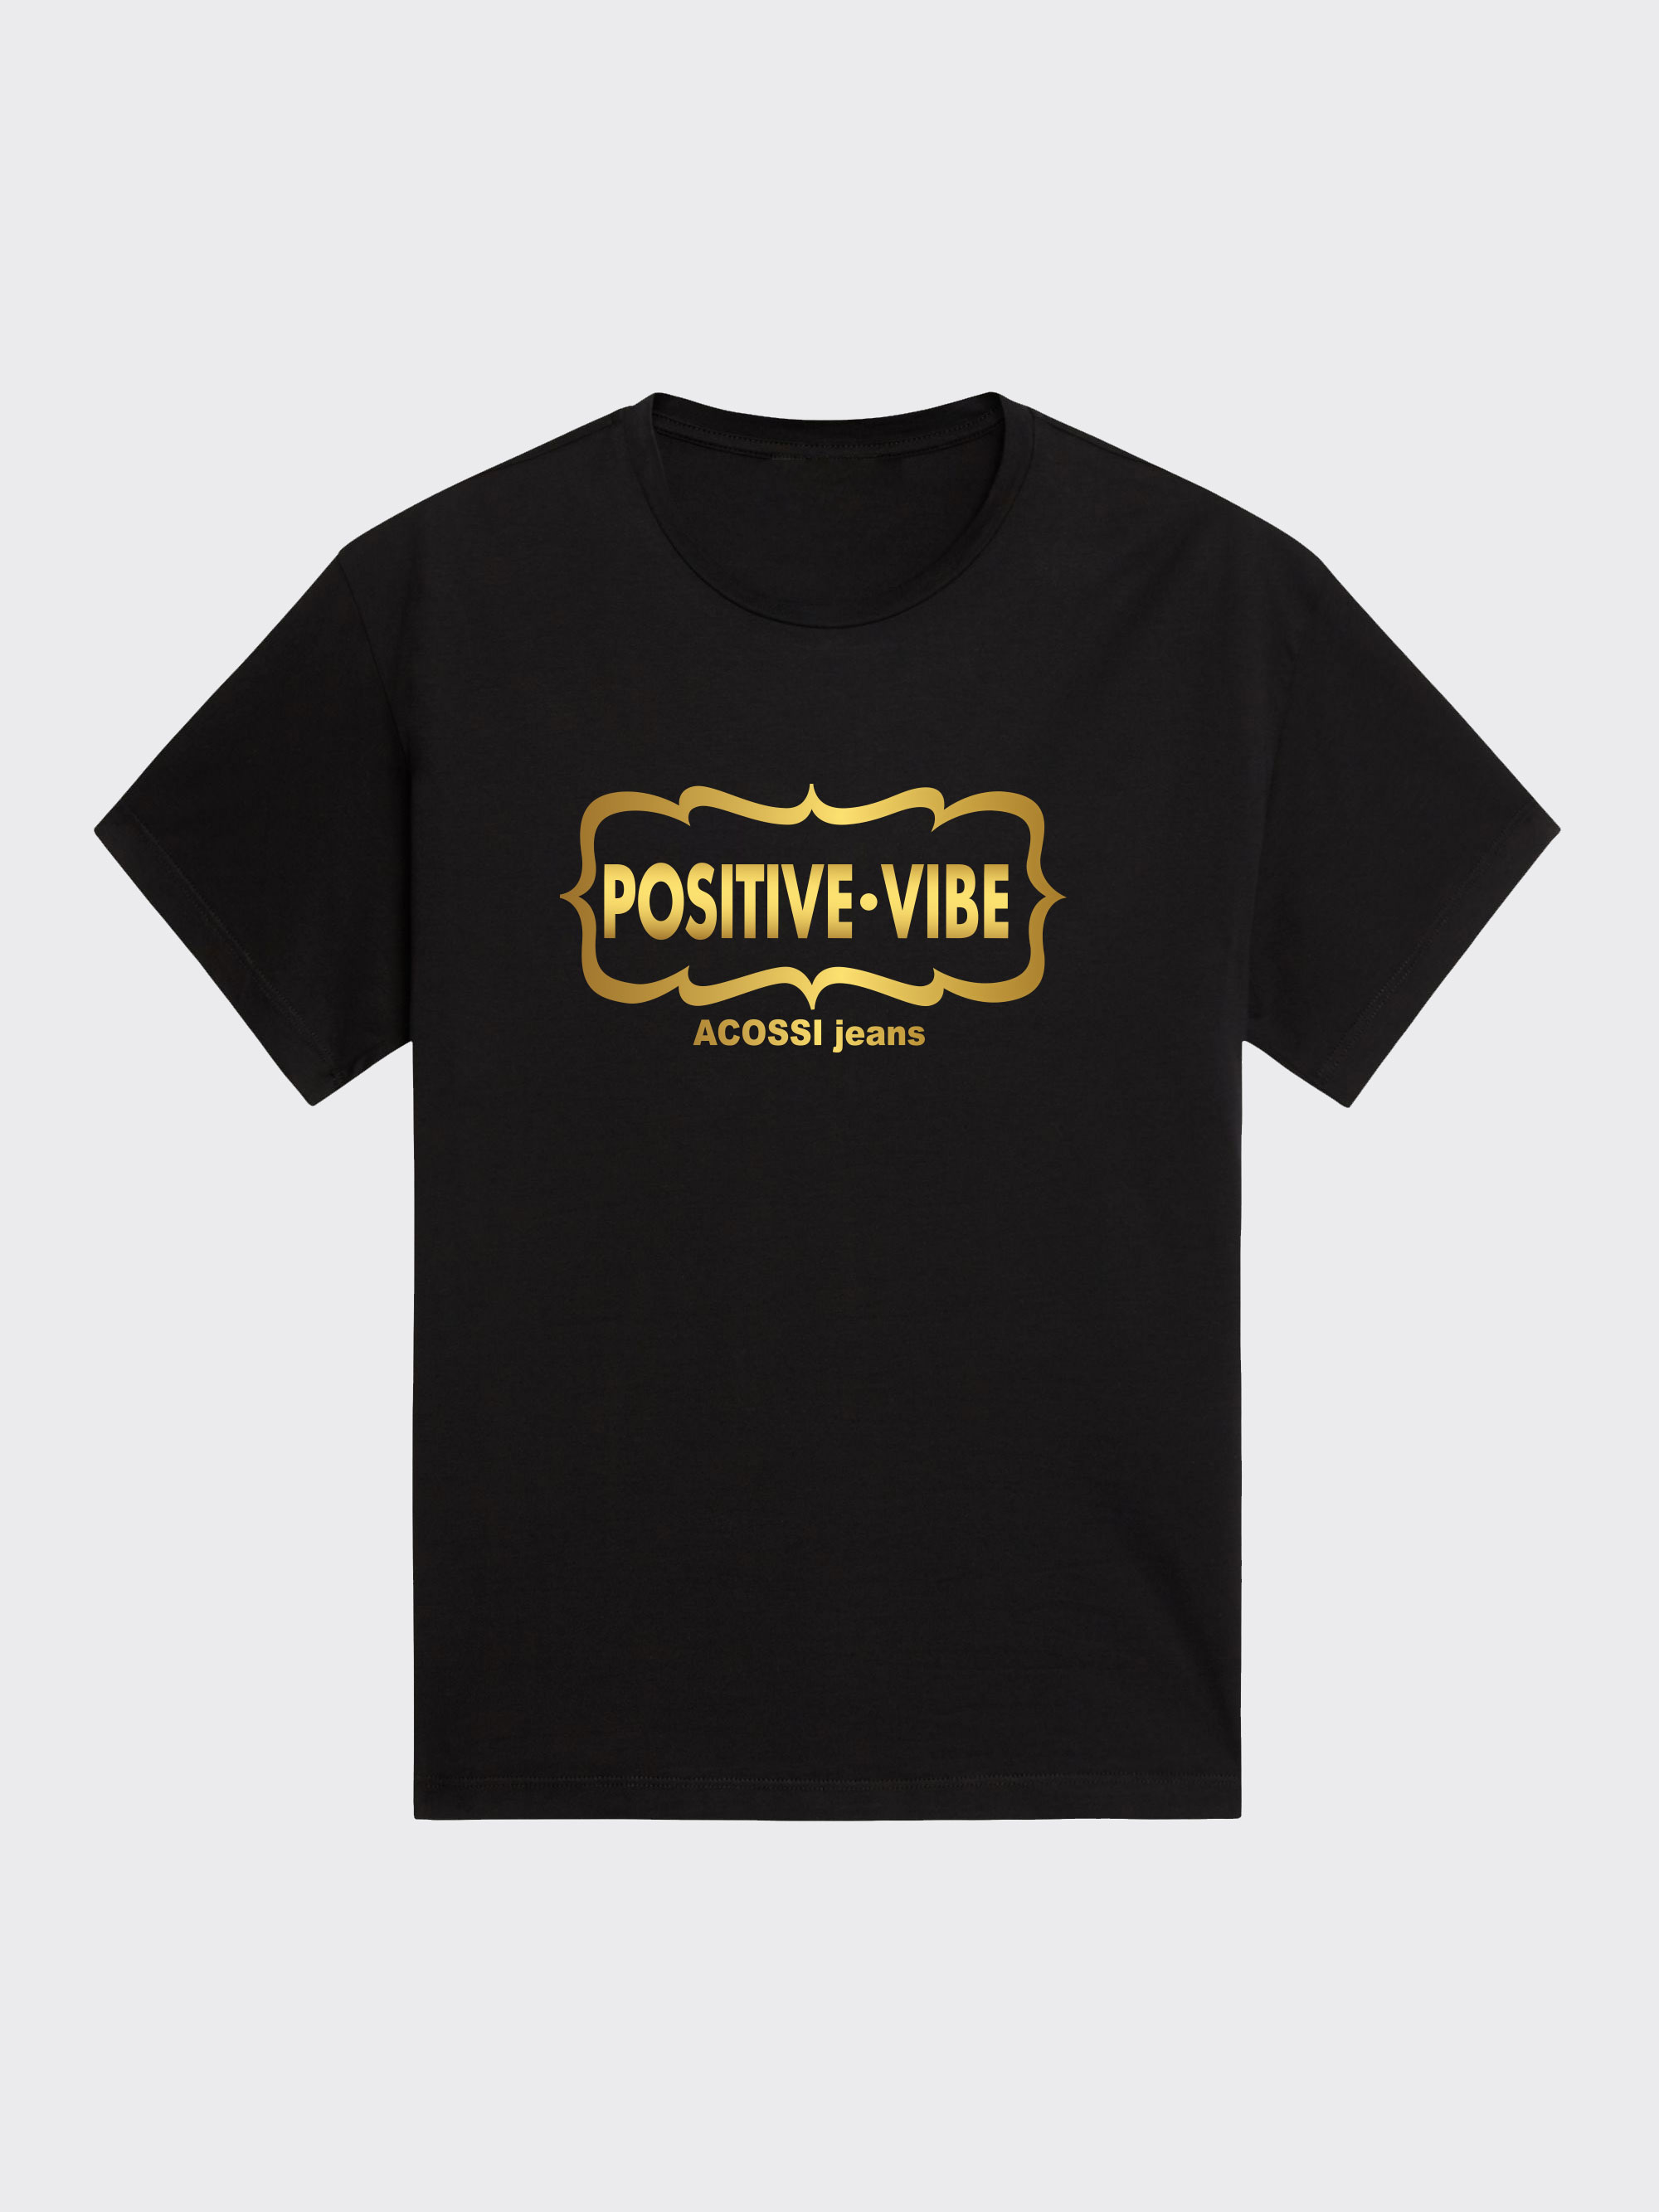 PositiveVibe-Gold-shsleeve-Blk.jpg